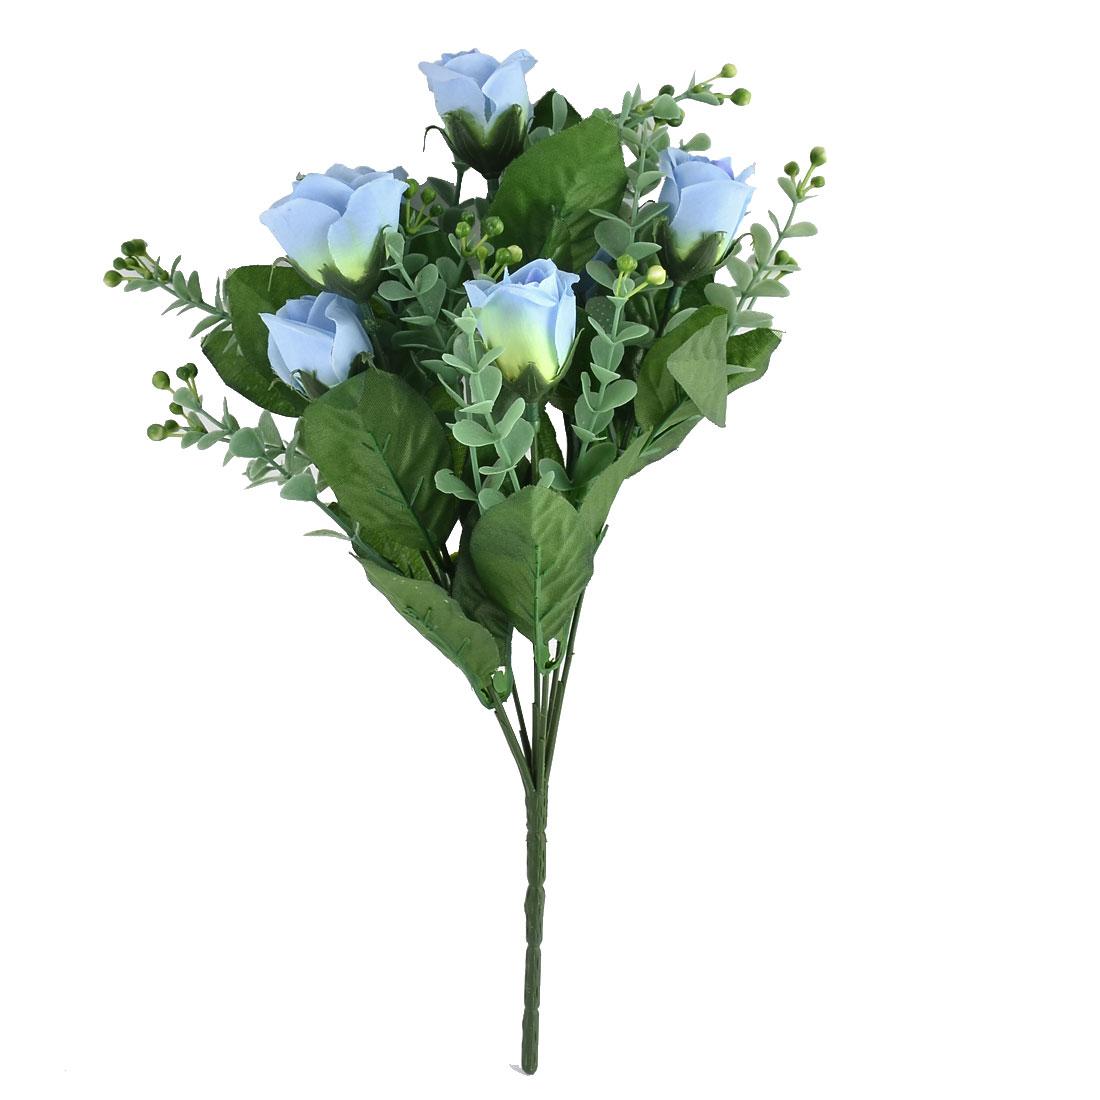 Festival Wedding Decorating 7 Heads Flower Blossom Artificial Rose Bouquet Blue